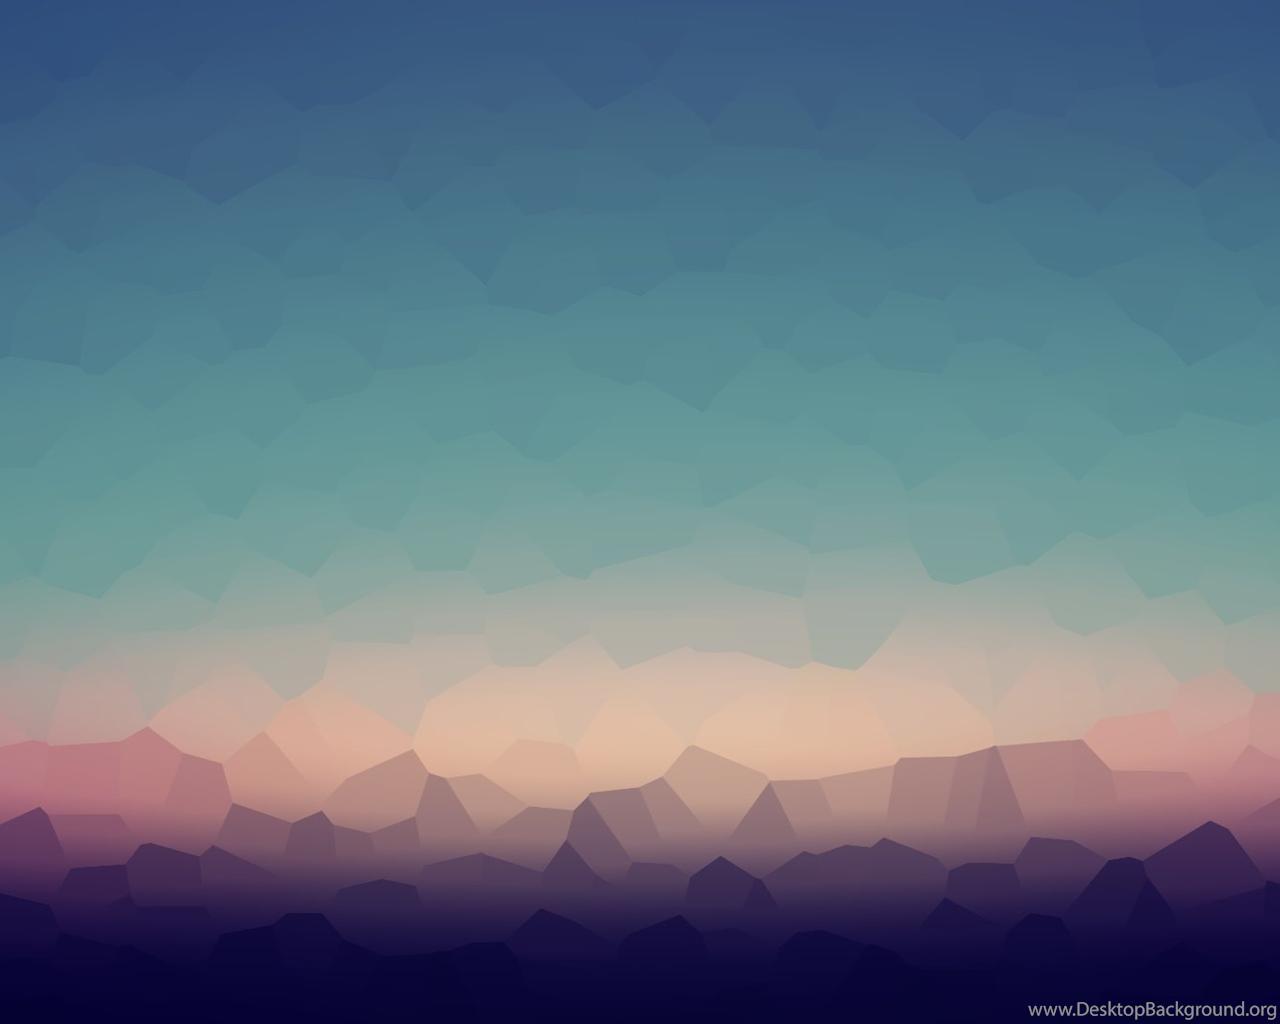 Digital art simple backgrounds wallpapers hd desktop - Art wallpaper hd for mobile ...